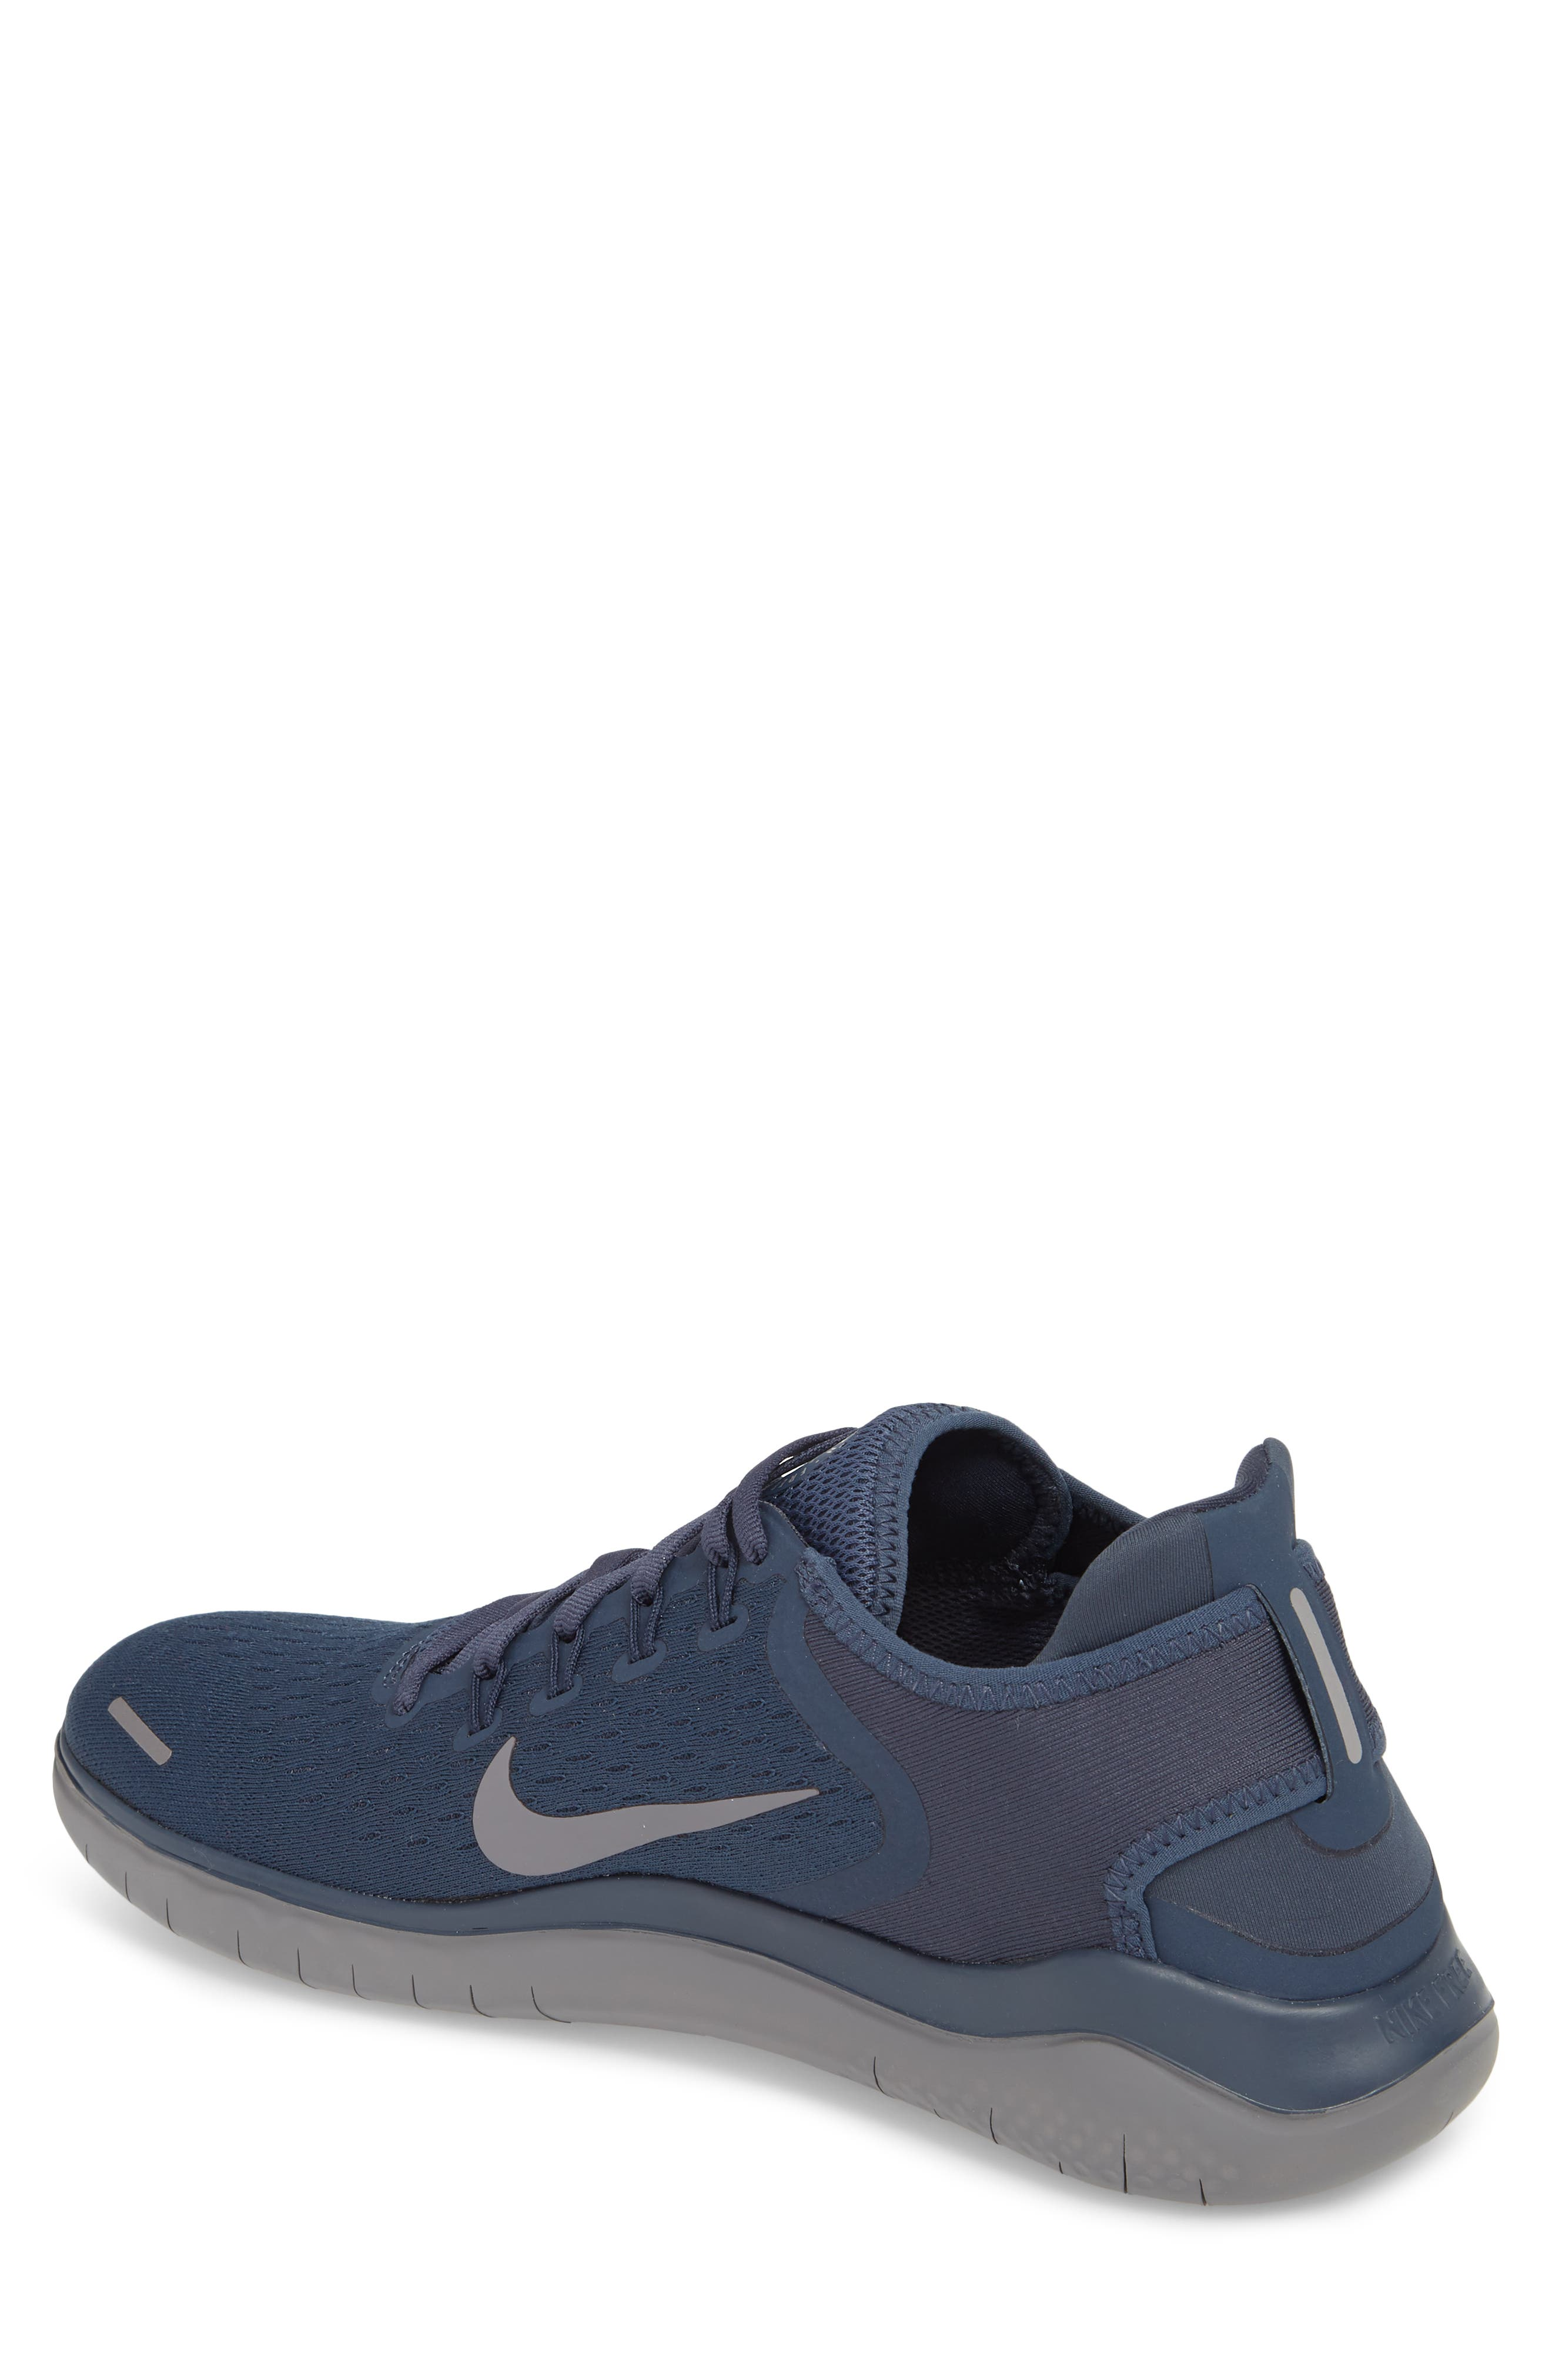 Free RN 2018 Running Shoe,                             Alternate thumbnail 2, color,                             THUNDER BLUE/ SMOKE